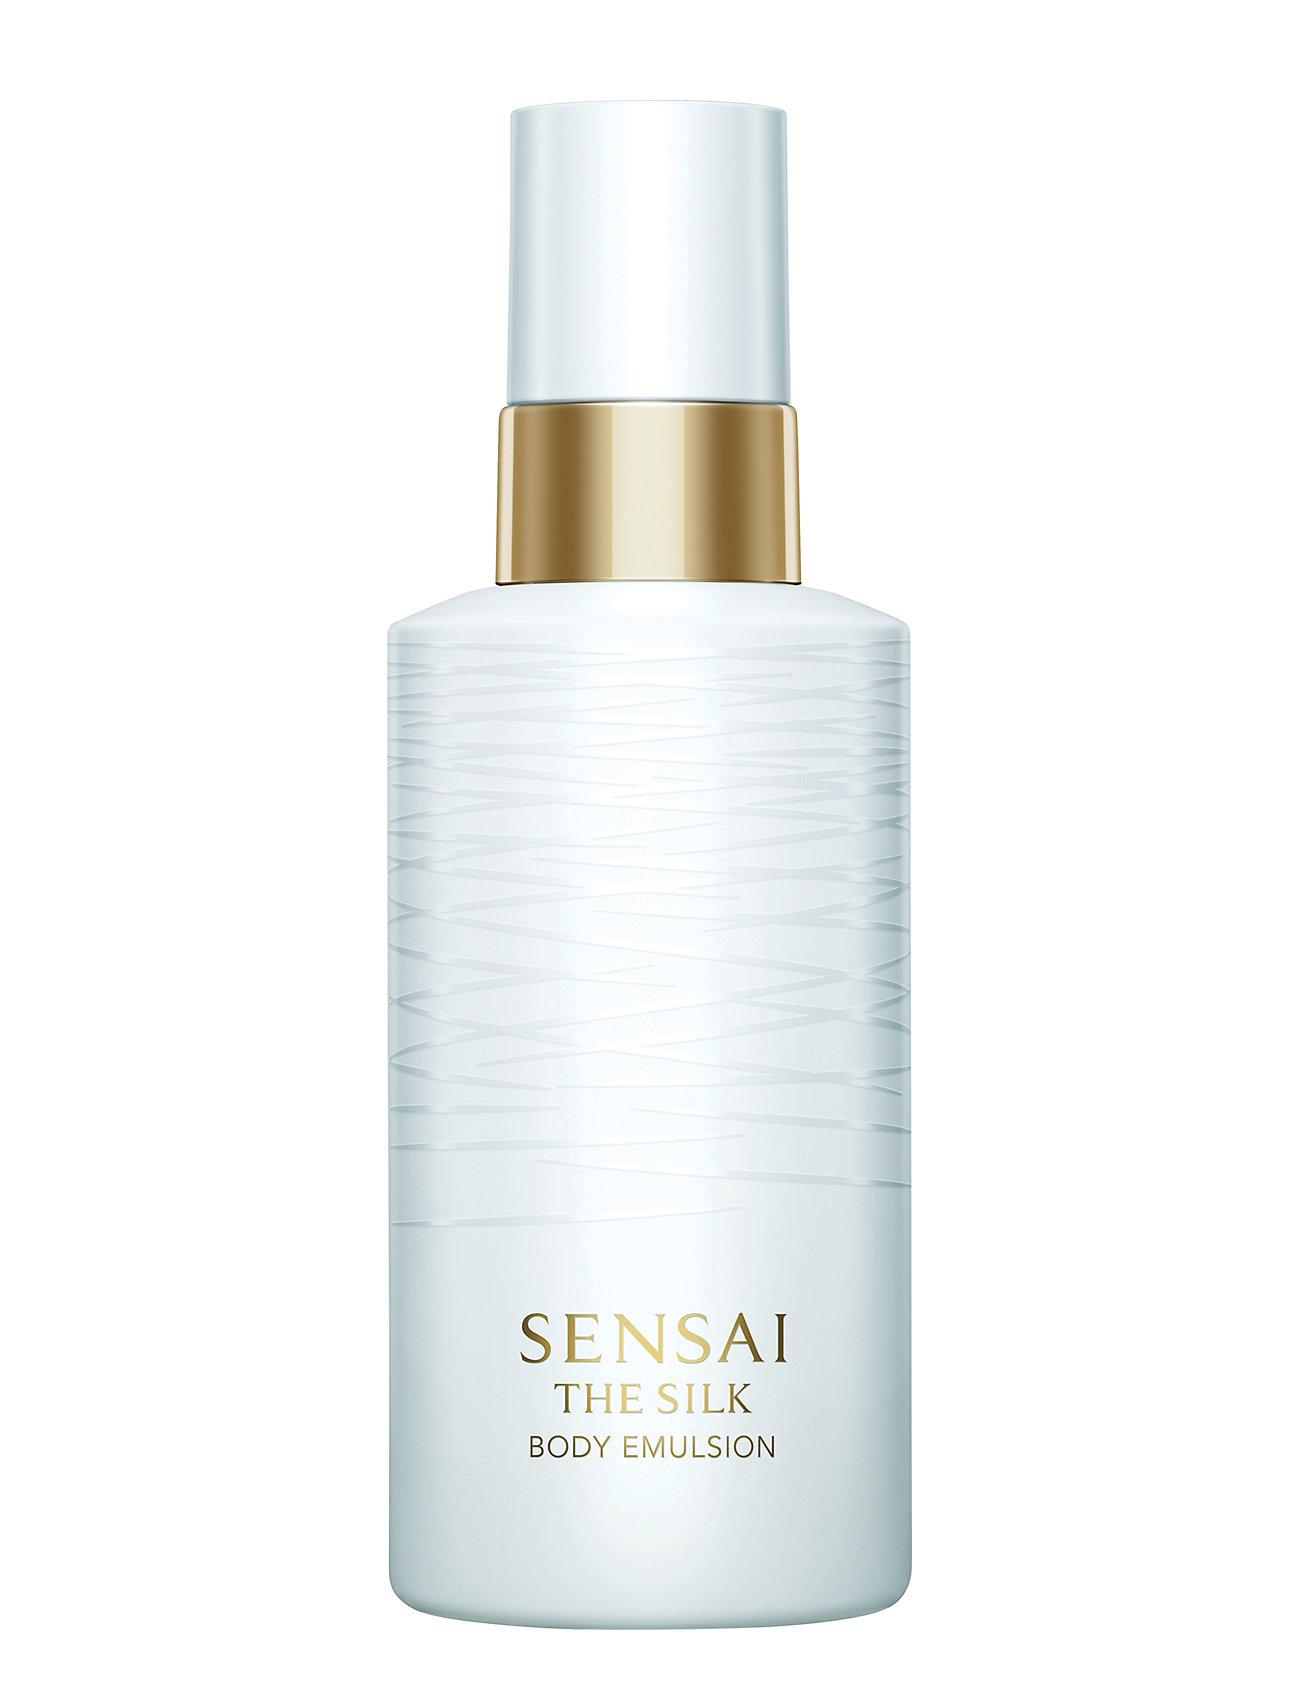 SENSAI The Silk Body Emulsion - NO COLOR